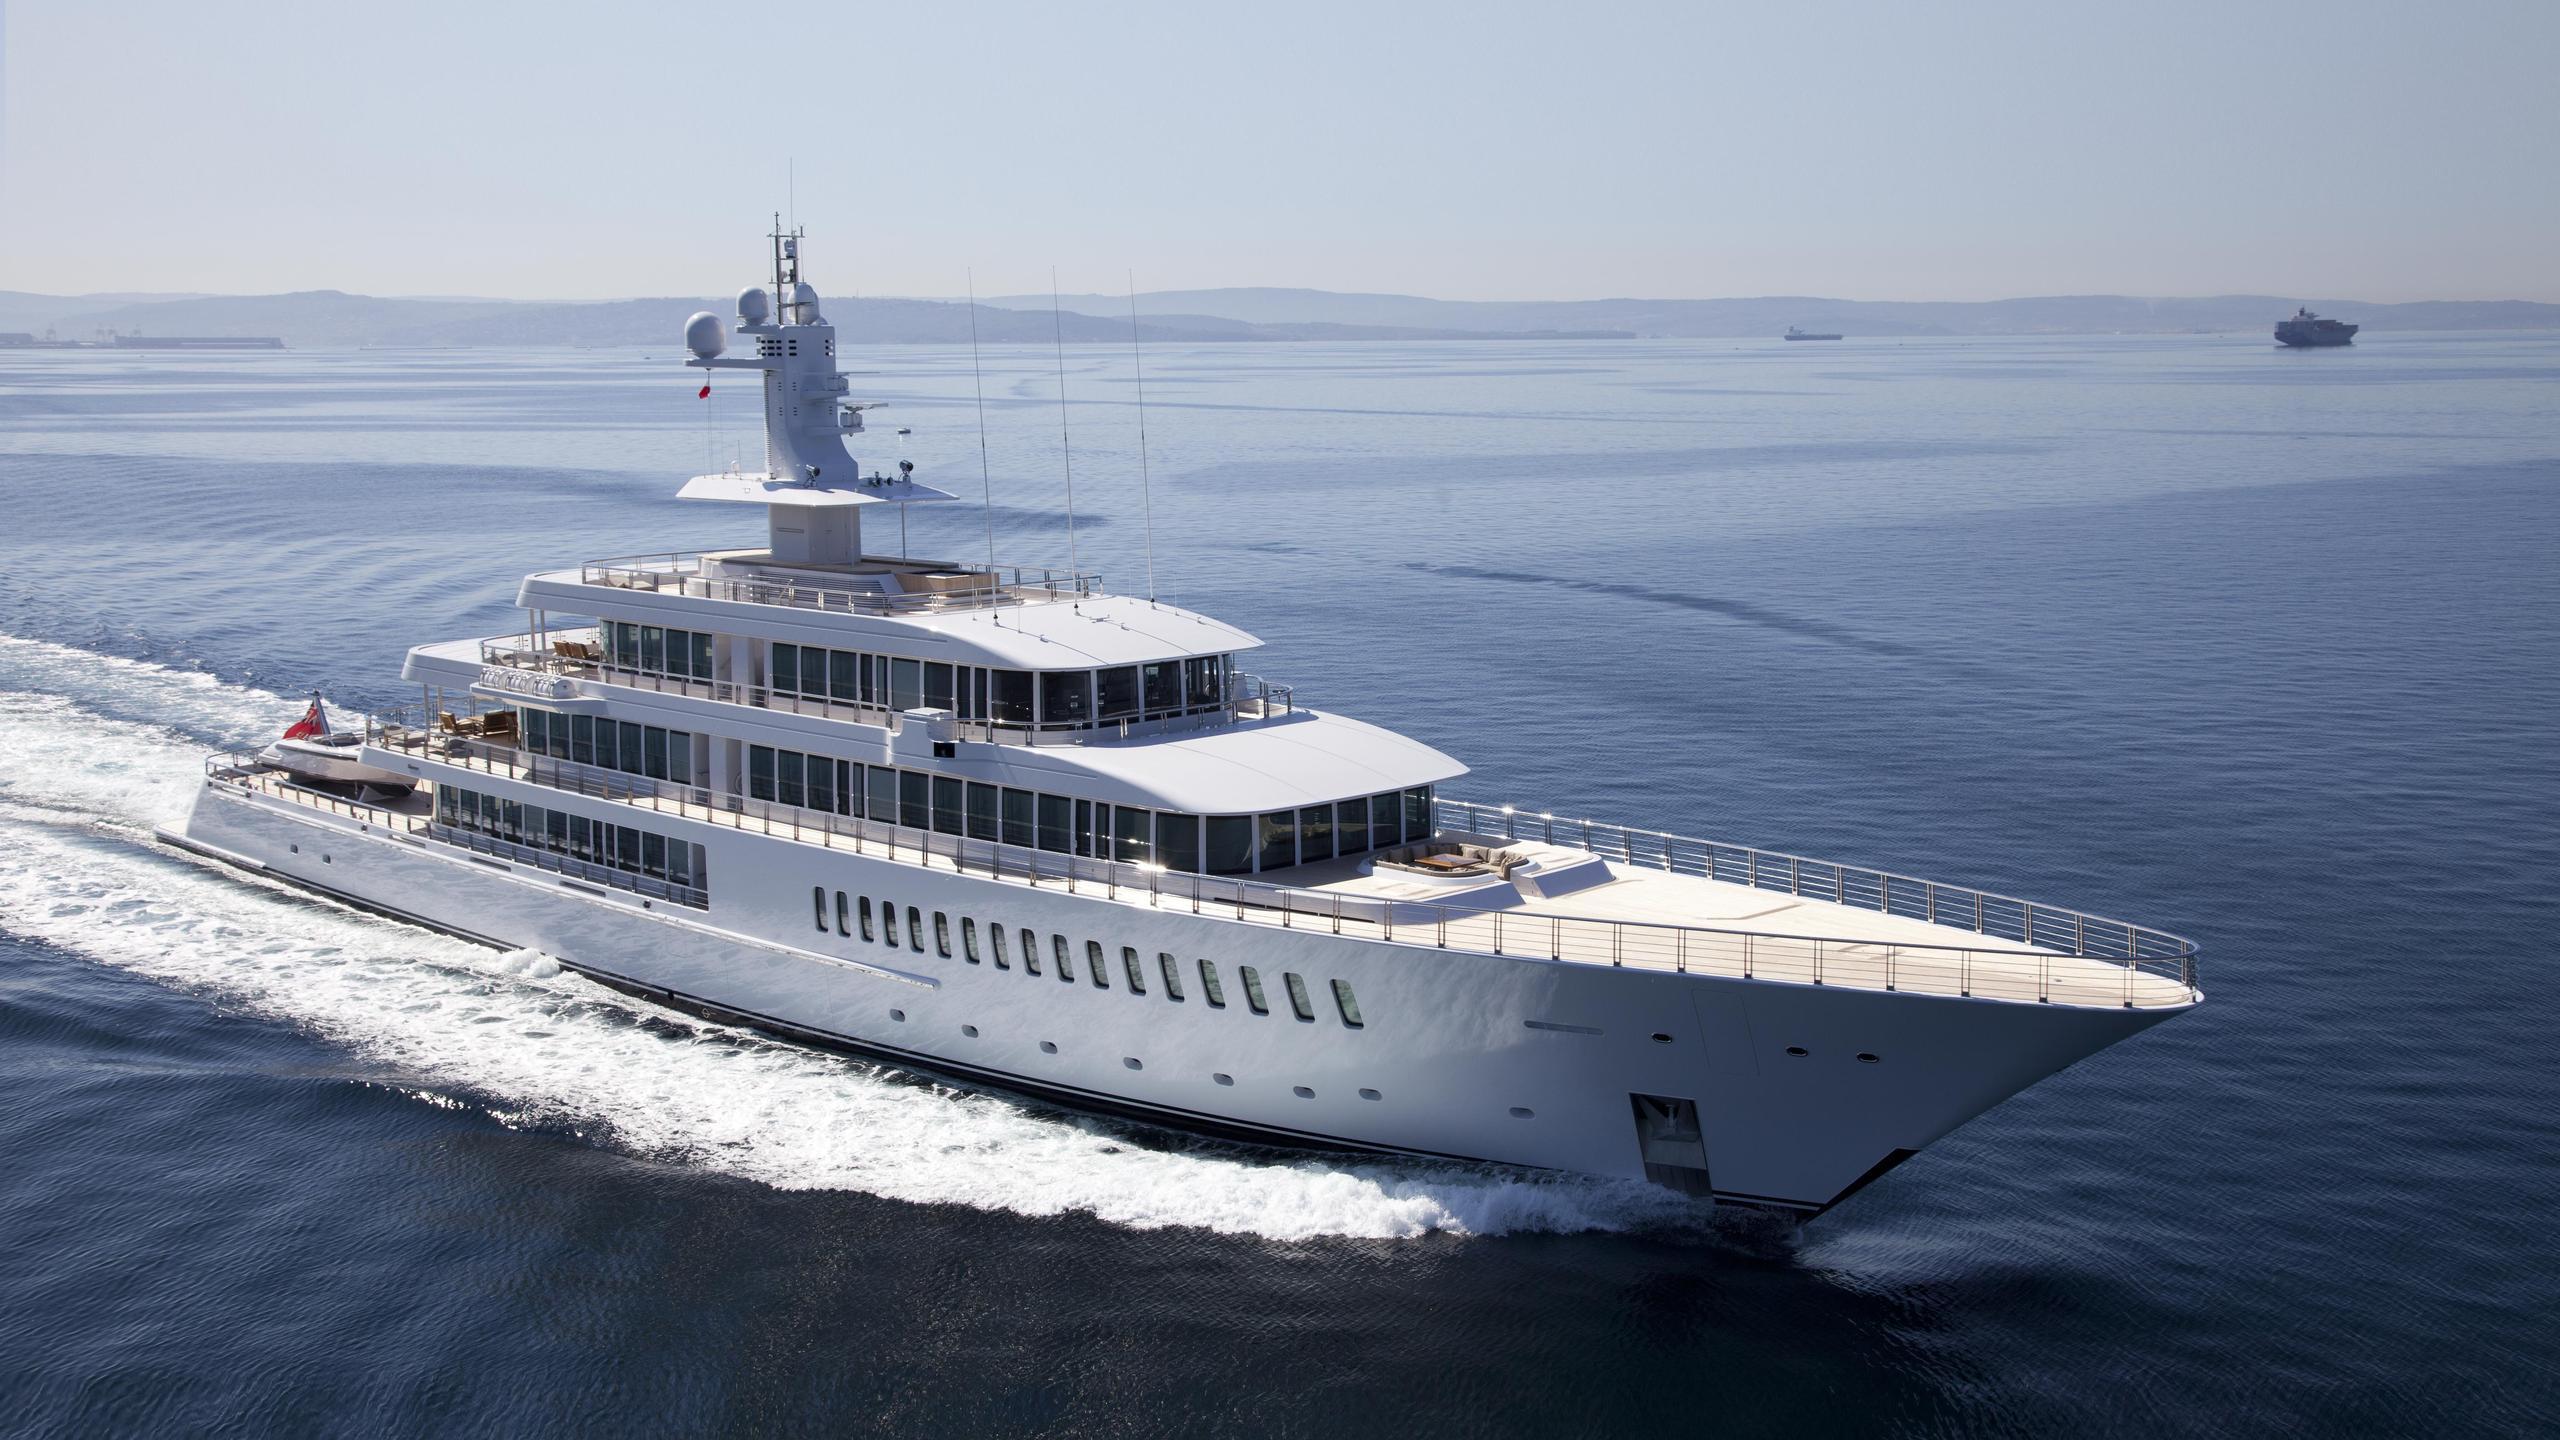 musashi-motor-yacht-feadhsip-2011-88m-profile-cruising